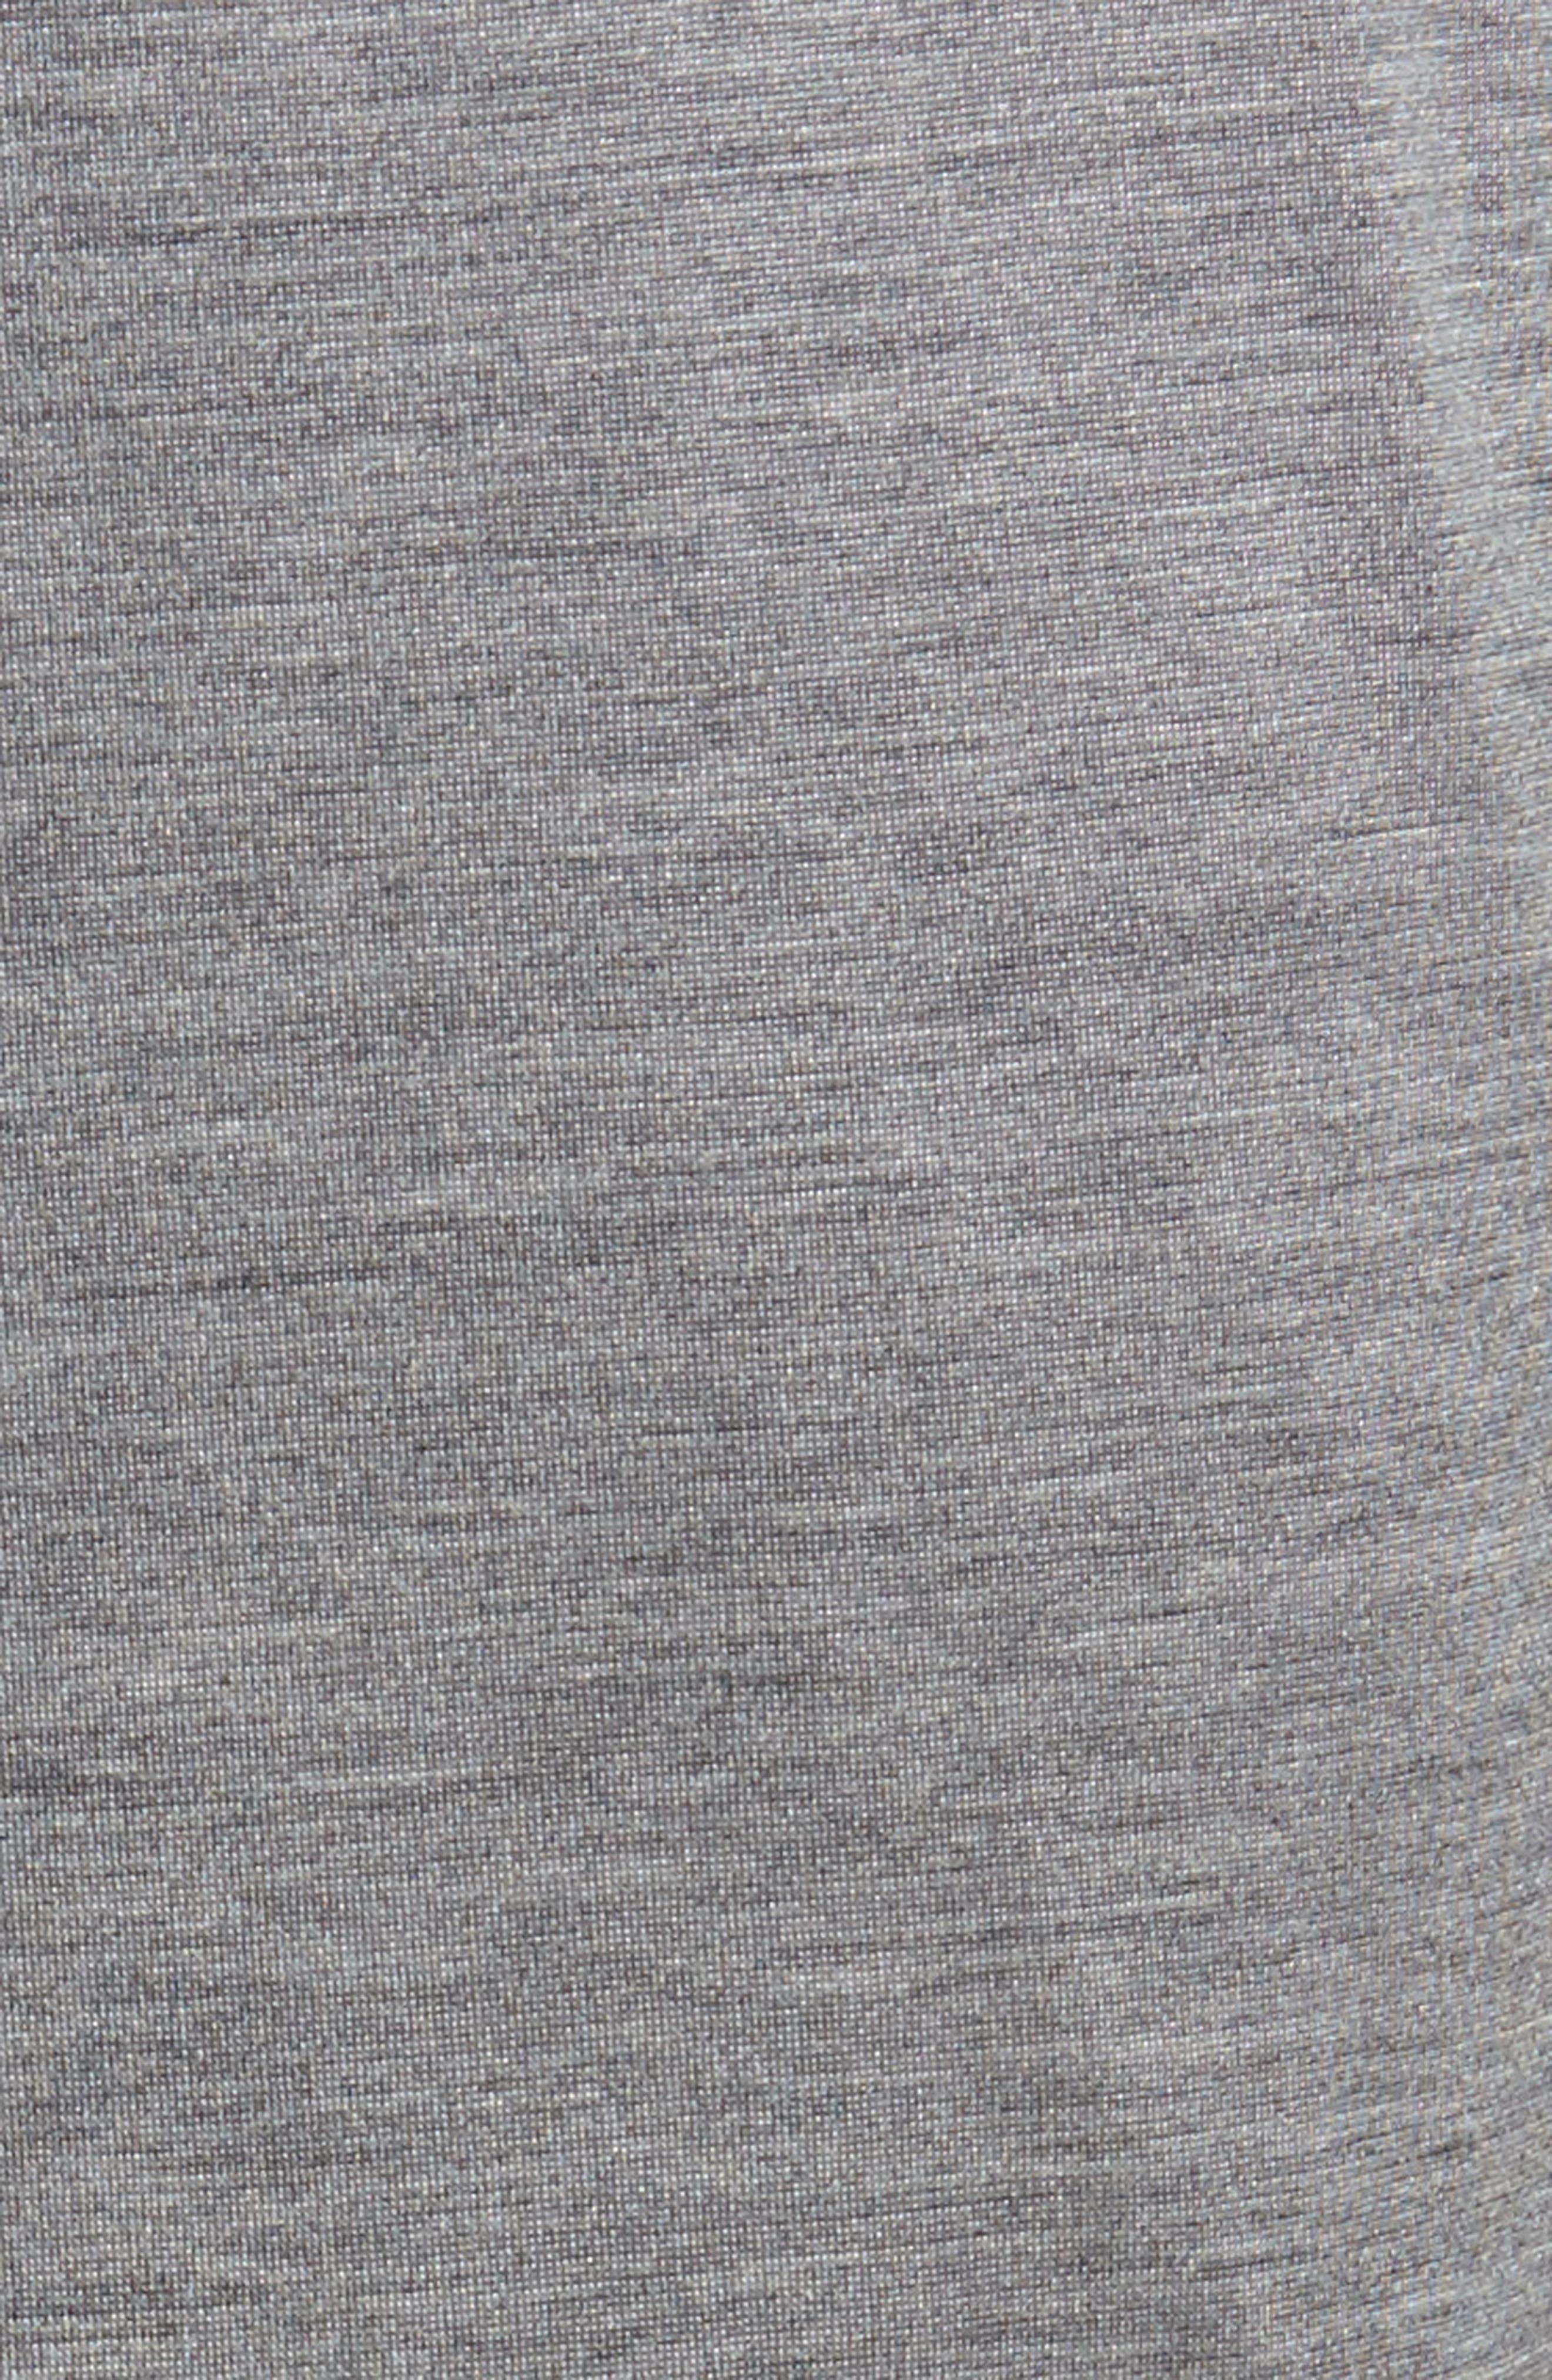 Silk & Cotton Lounge Pants,                             Alternate thumbnail 5, color,                             CHARCOAL HEATHER